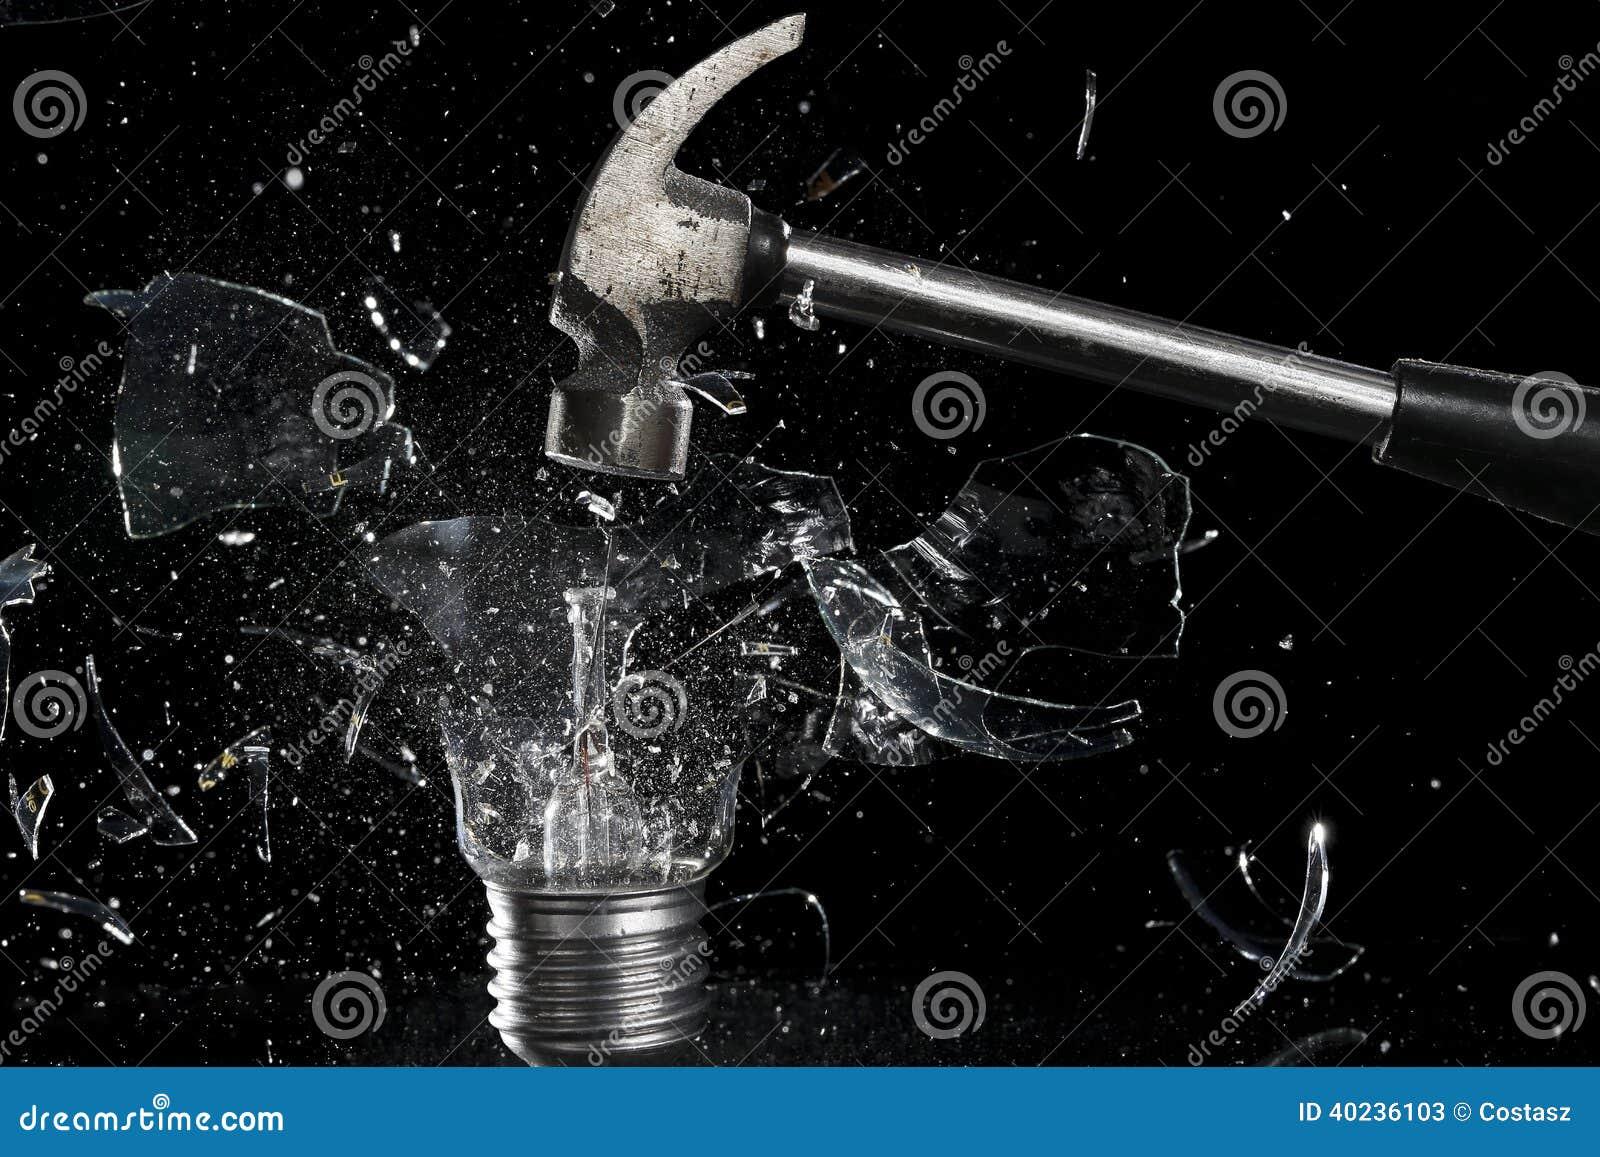 Smashing A Light Bulb Stock Image Image Of Black